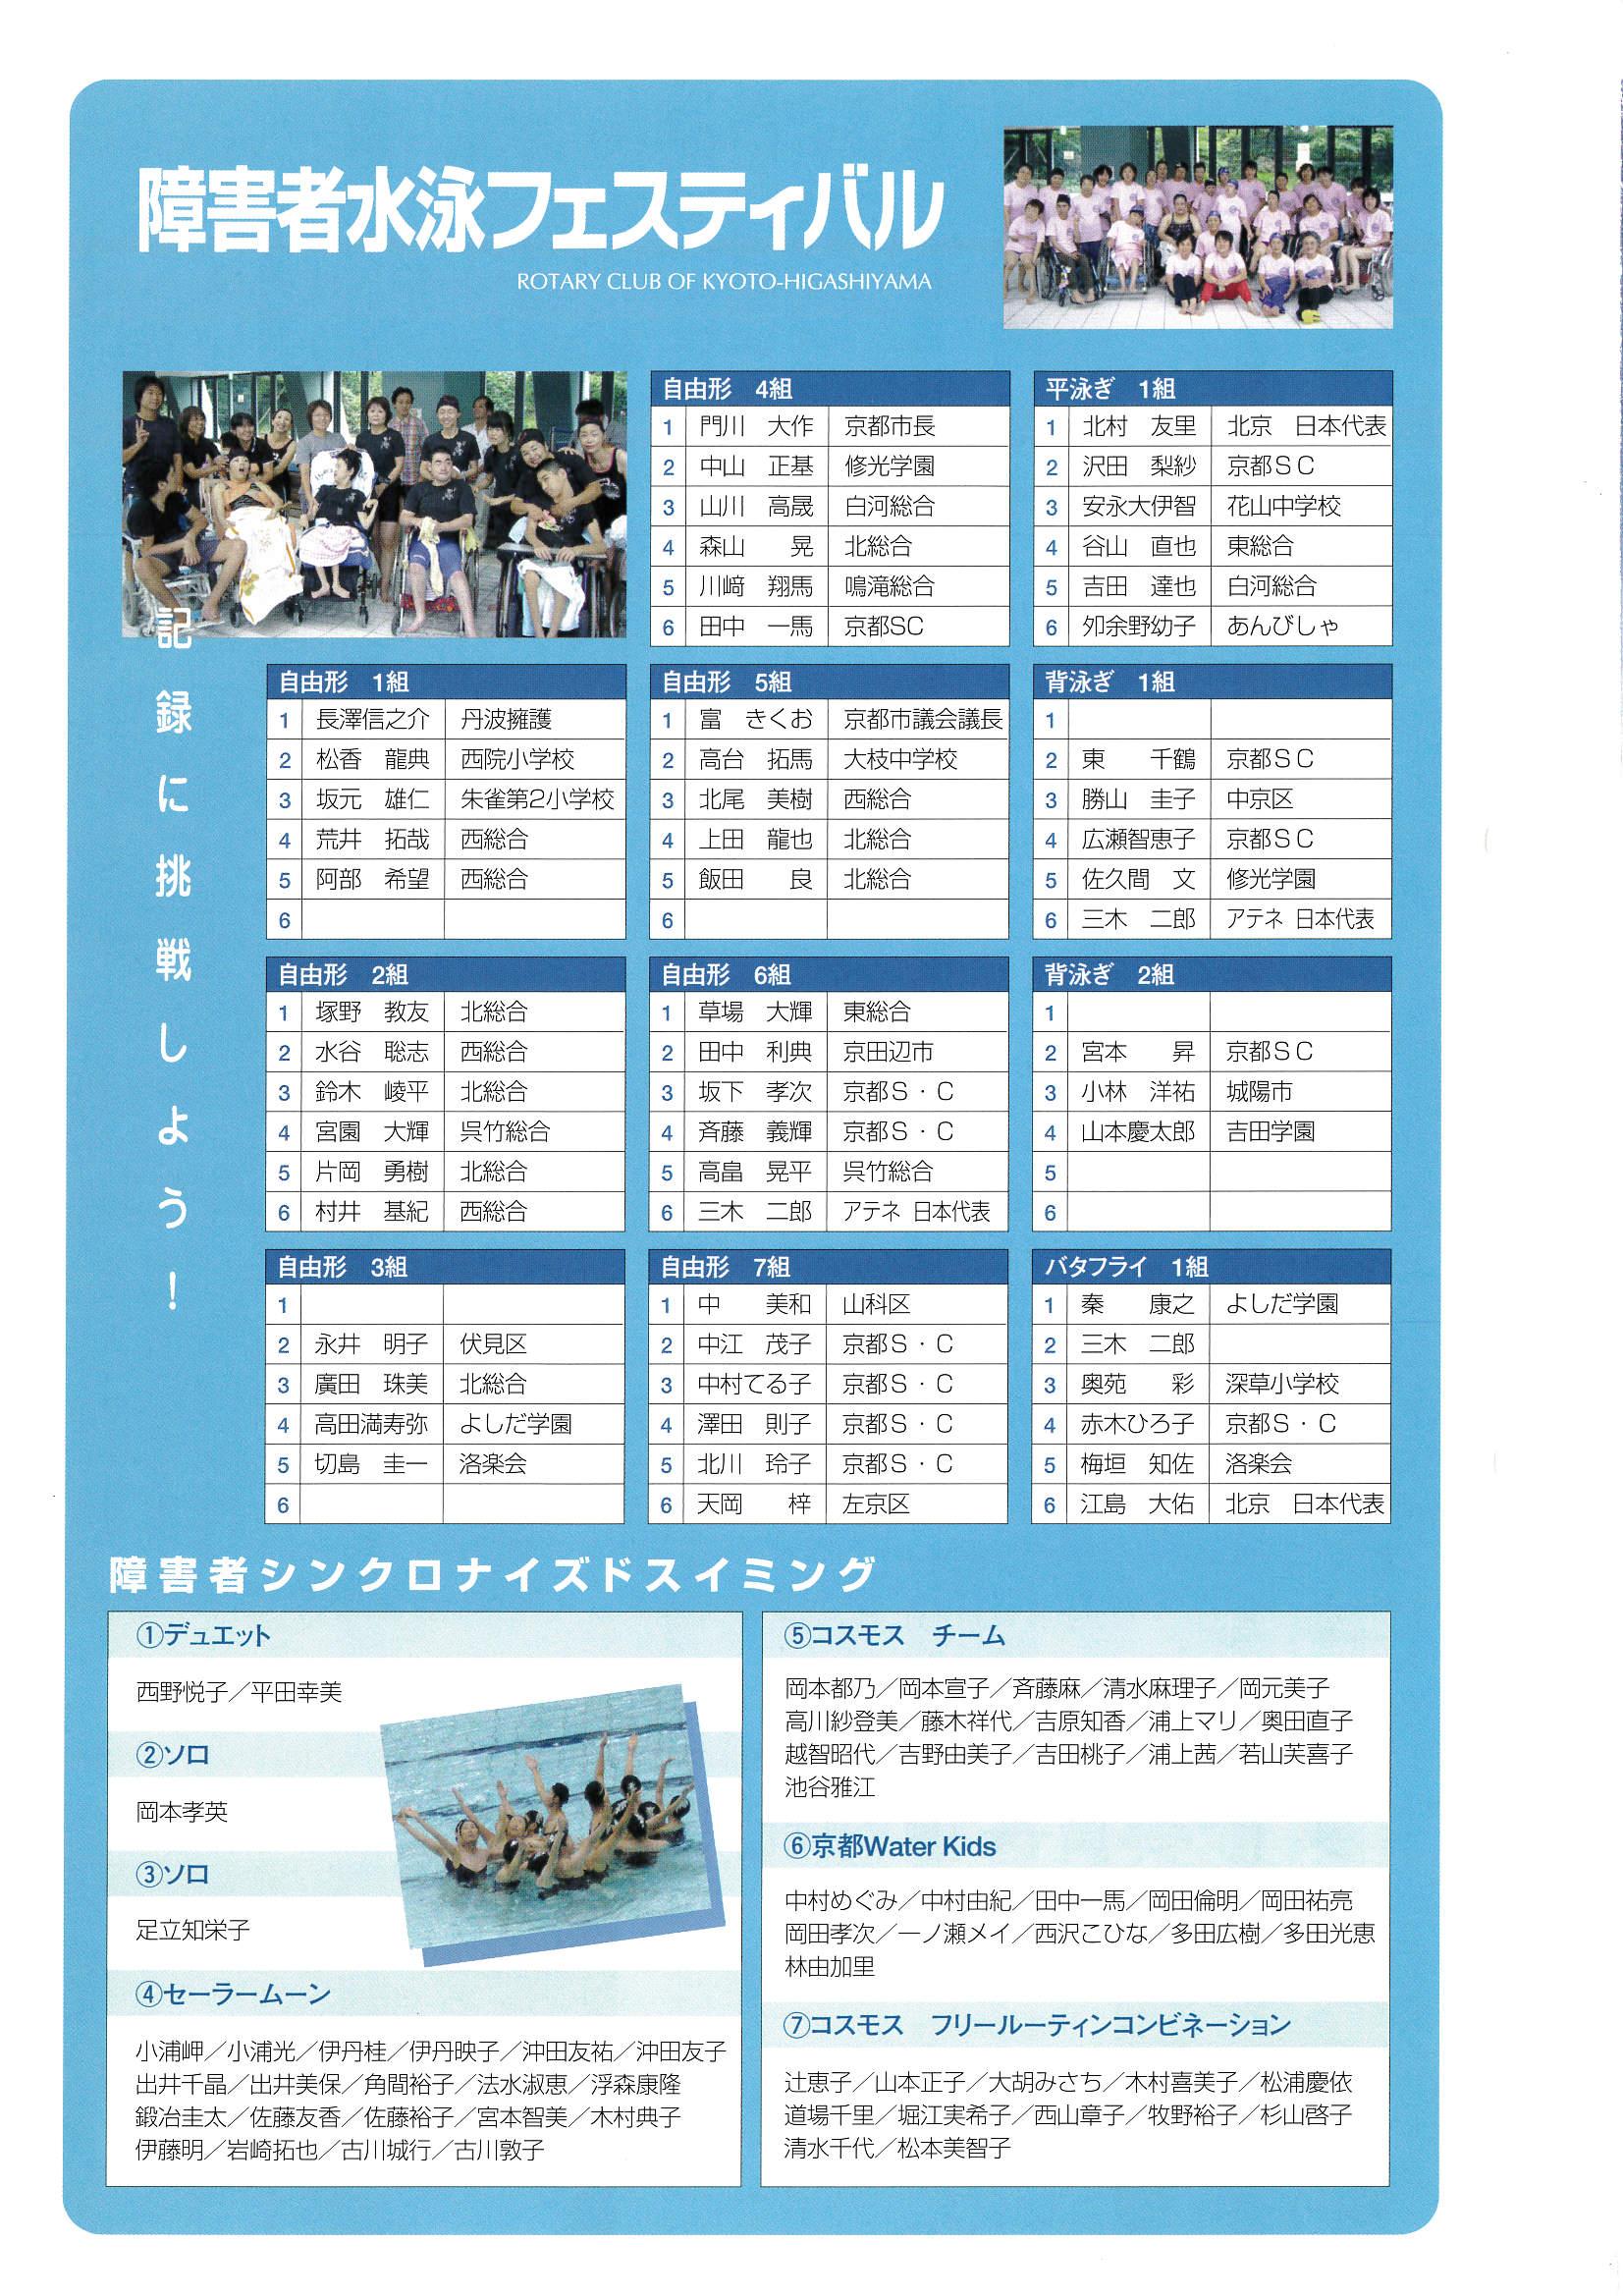 http://www.higashiyamarc.com/2016/07/25/p04.jpg